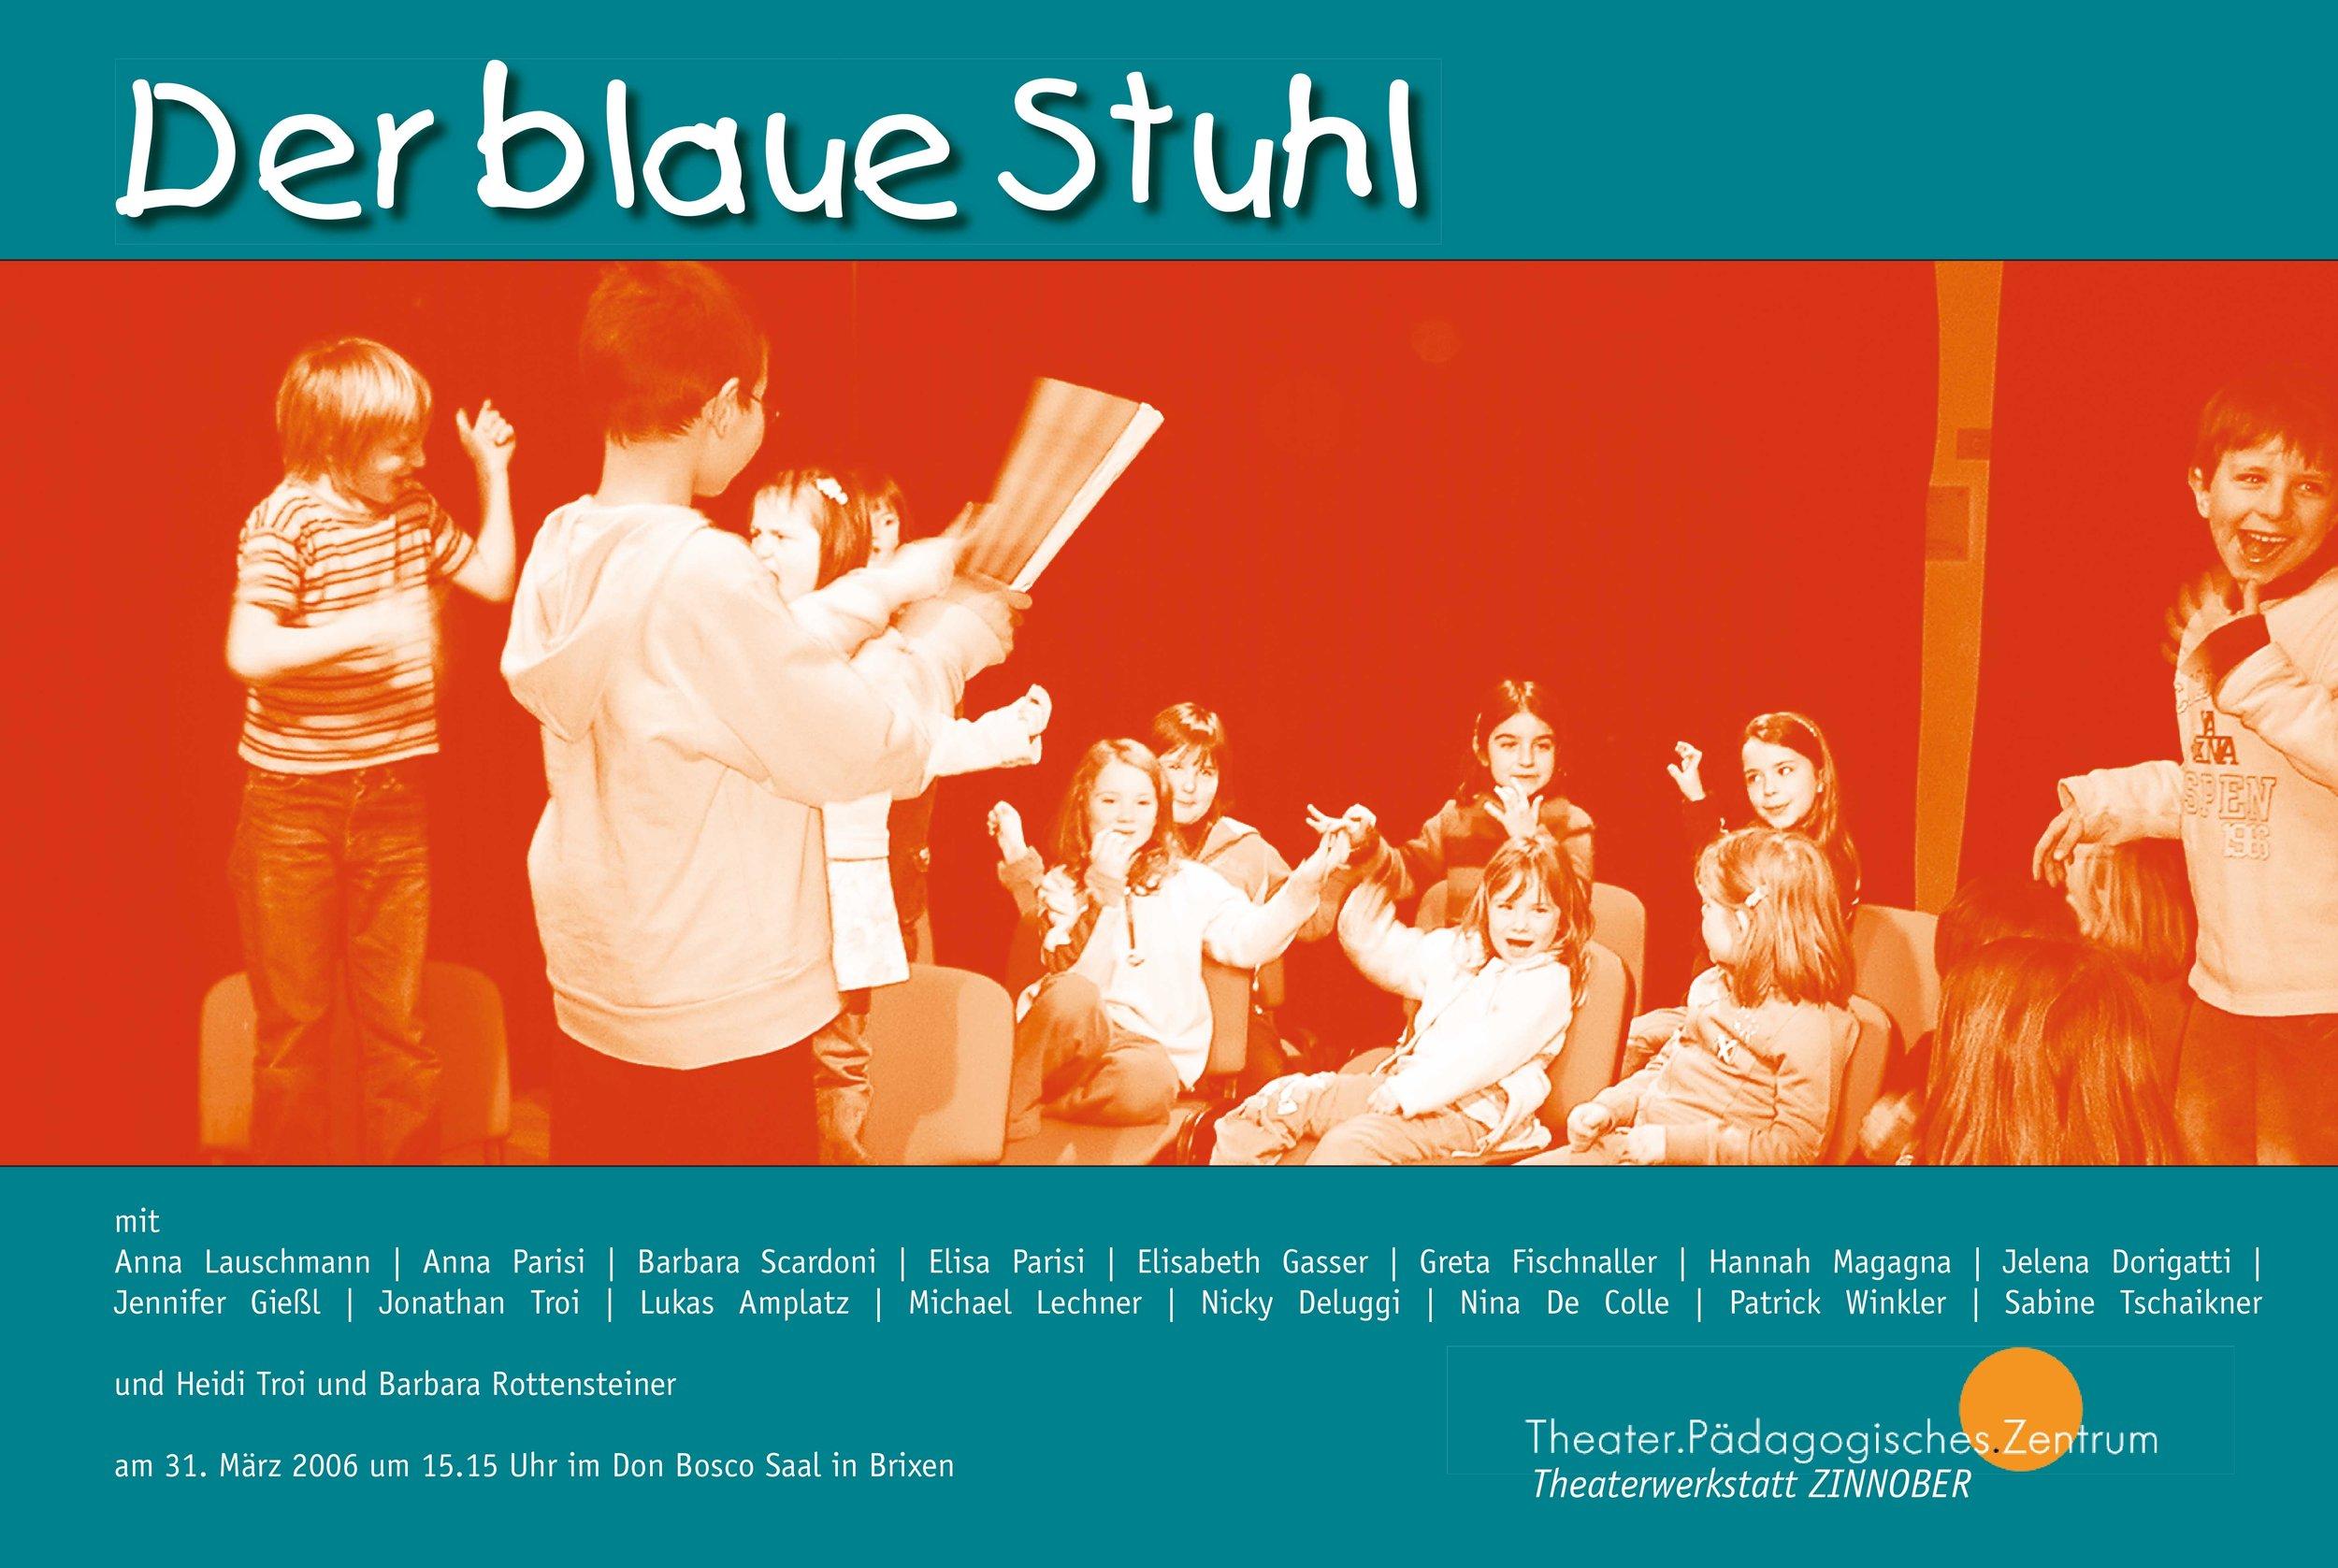 2006-zinnober-Der-blaue-Stuhl-Plakat-web.jpg